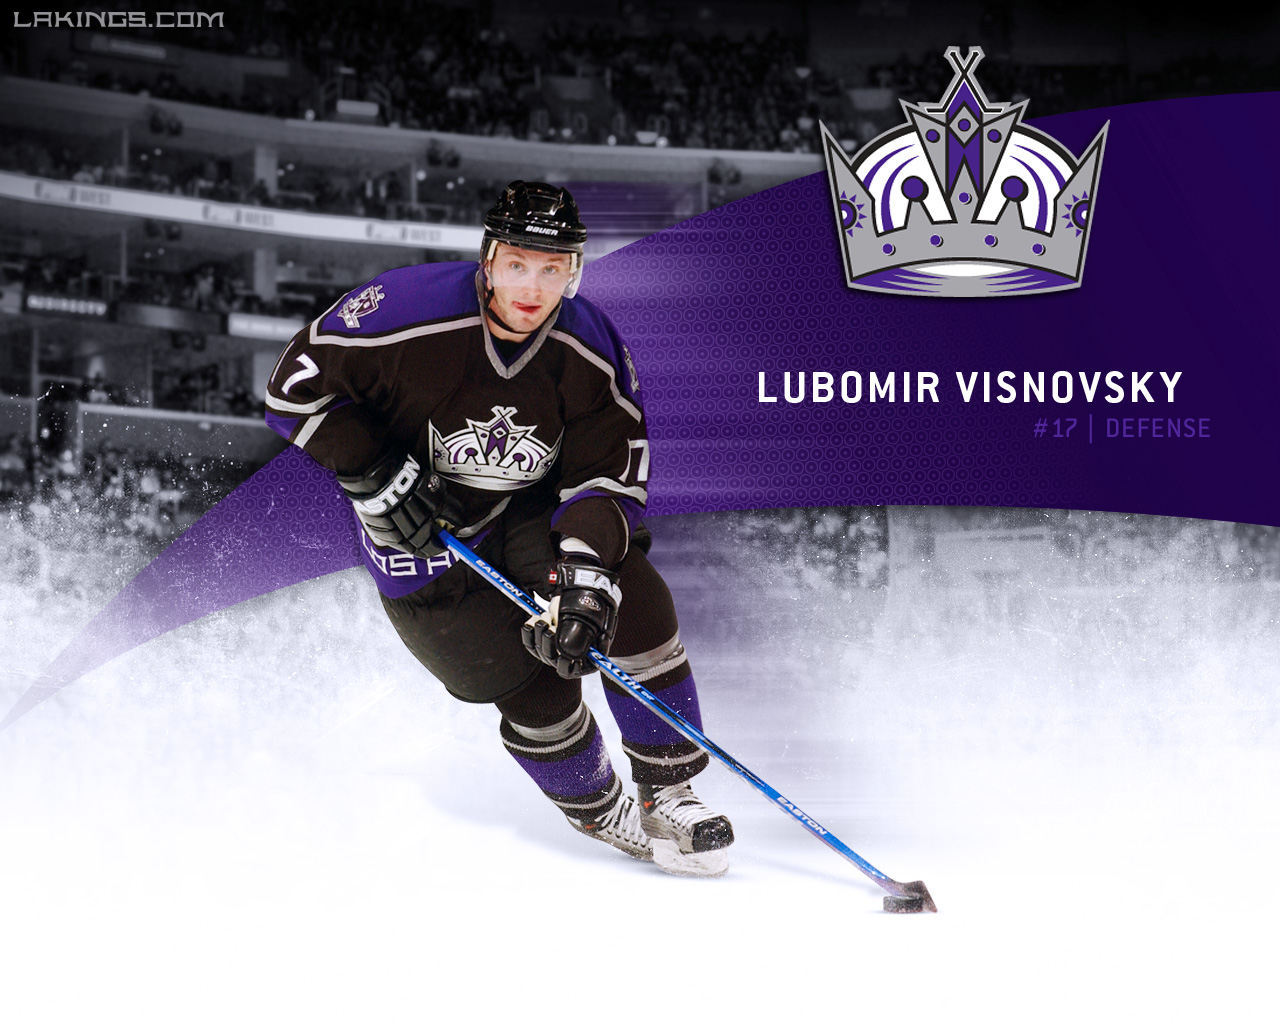 http://1.bp.blogspot.com/-21MMCcttBIs/T7PxocQYdaI/AAAAAAAABJg/hibE-vUETMI/s1600/Los-Angeles-Kings-Lubomir-Visnovsky-1-CQBBDLEHTJ-1280x1024.jpg